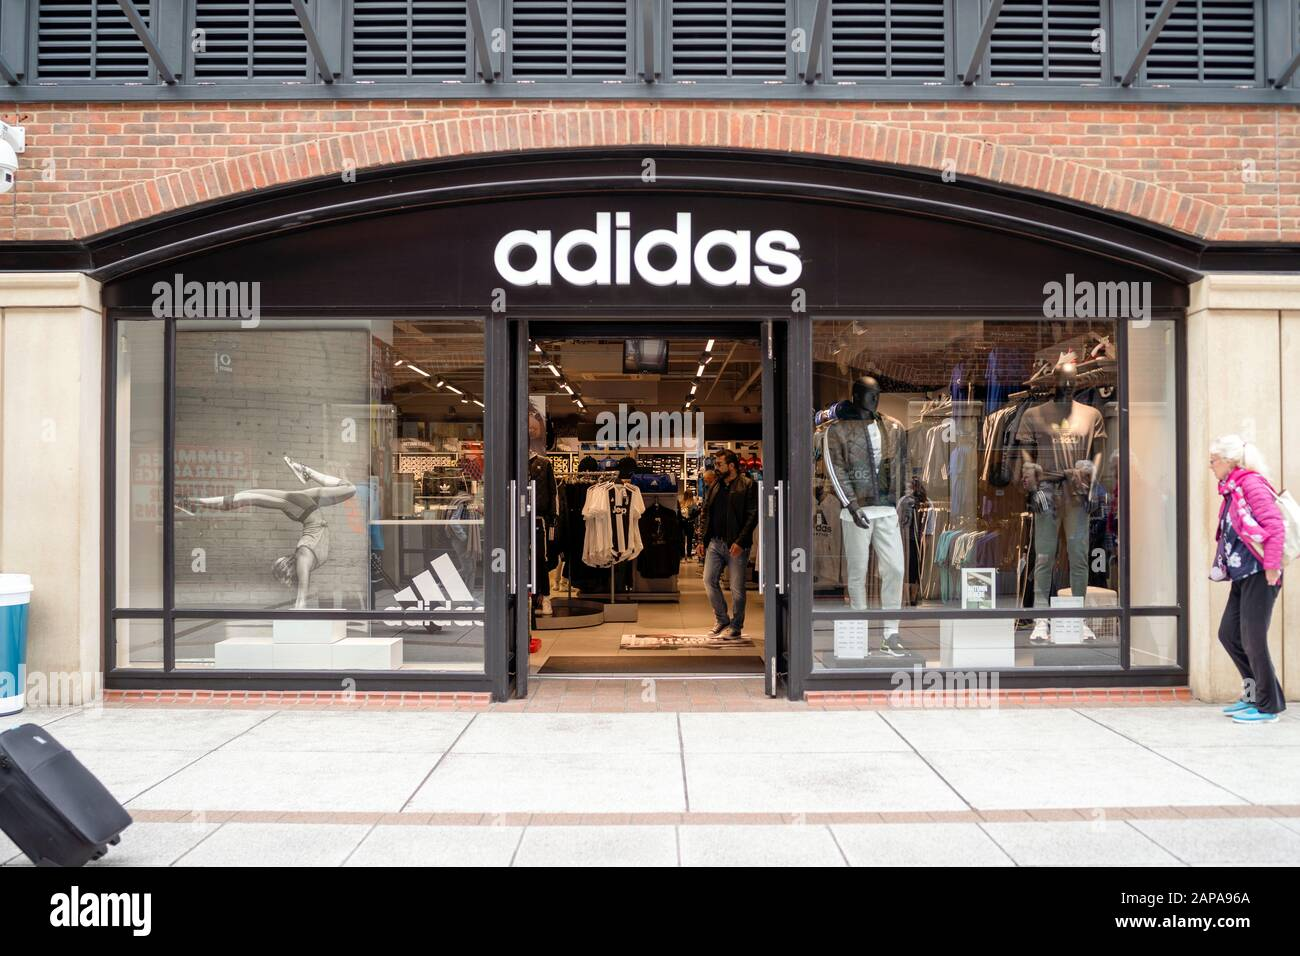 adidas showroom price